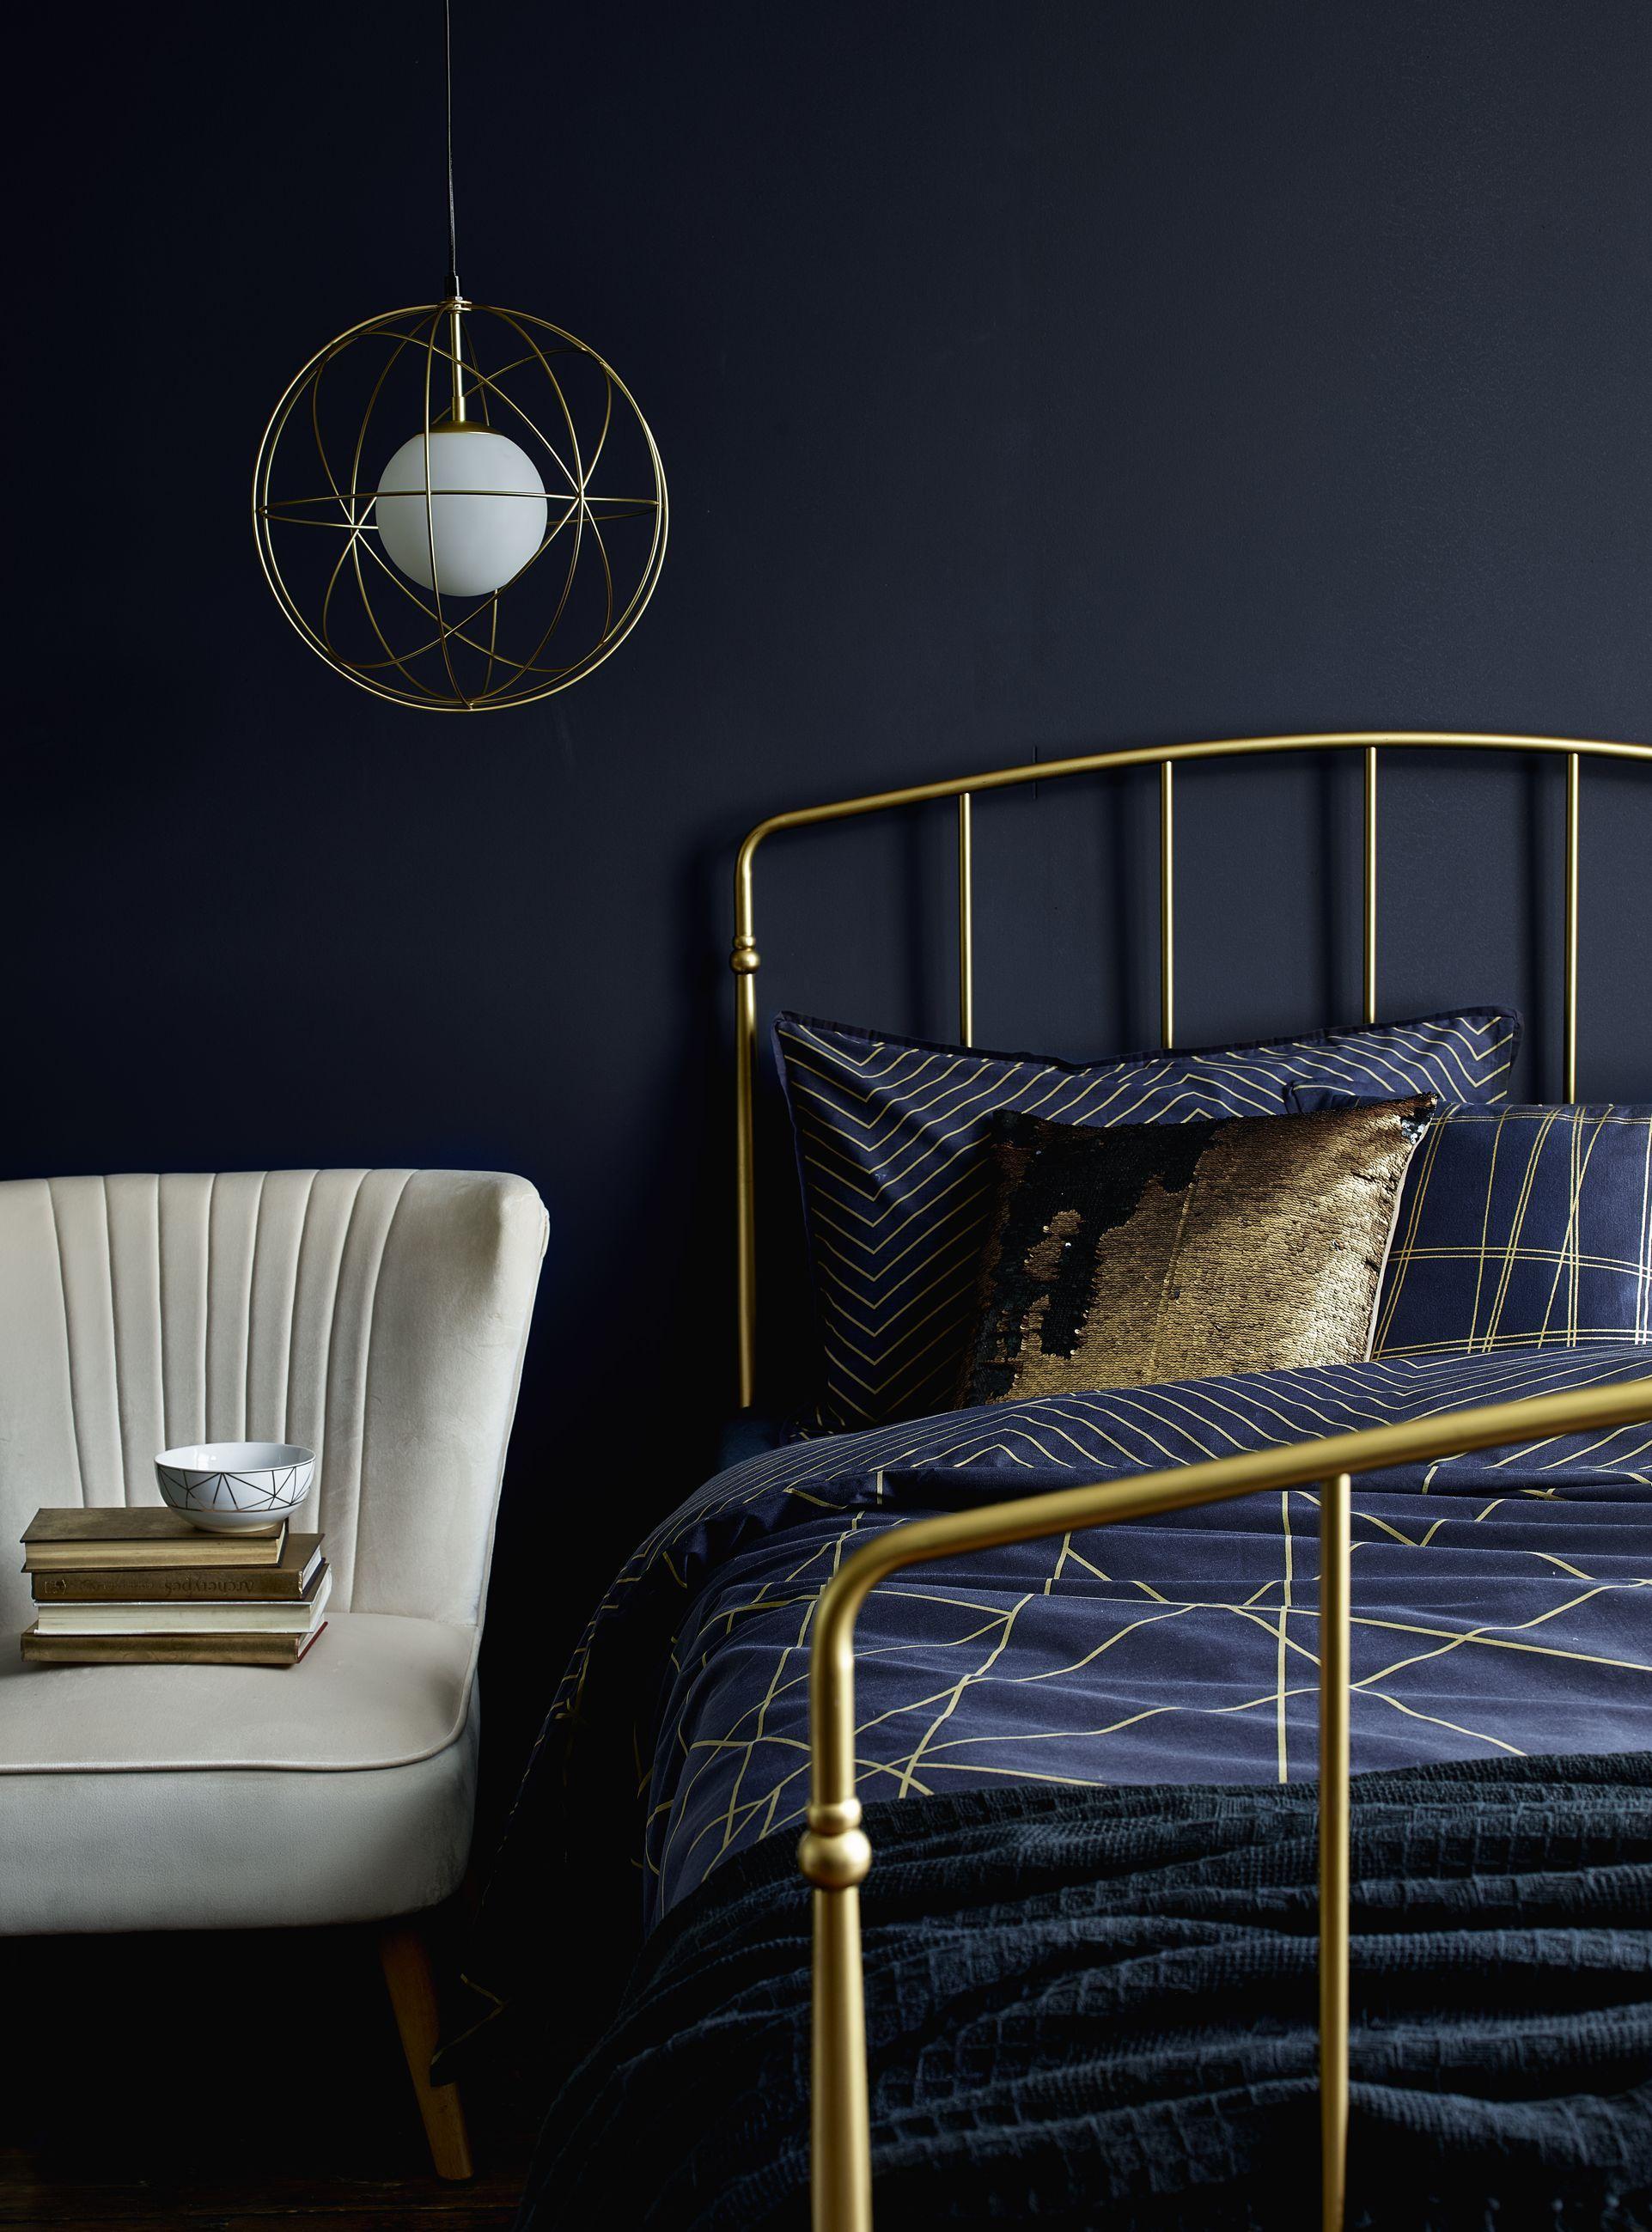 Bedroom Colors That Help You Sleep dark bedroom designs to help you sleep | new house | pinterest